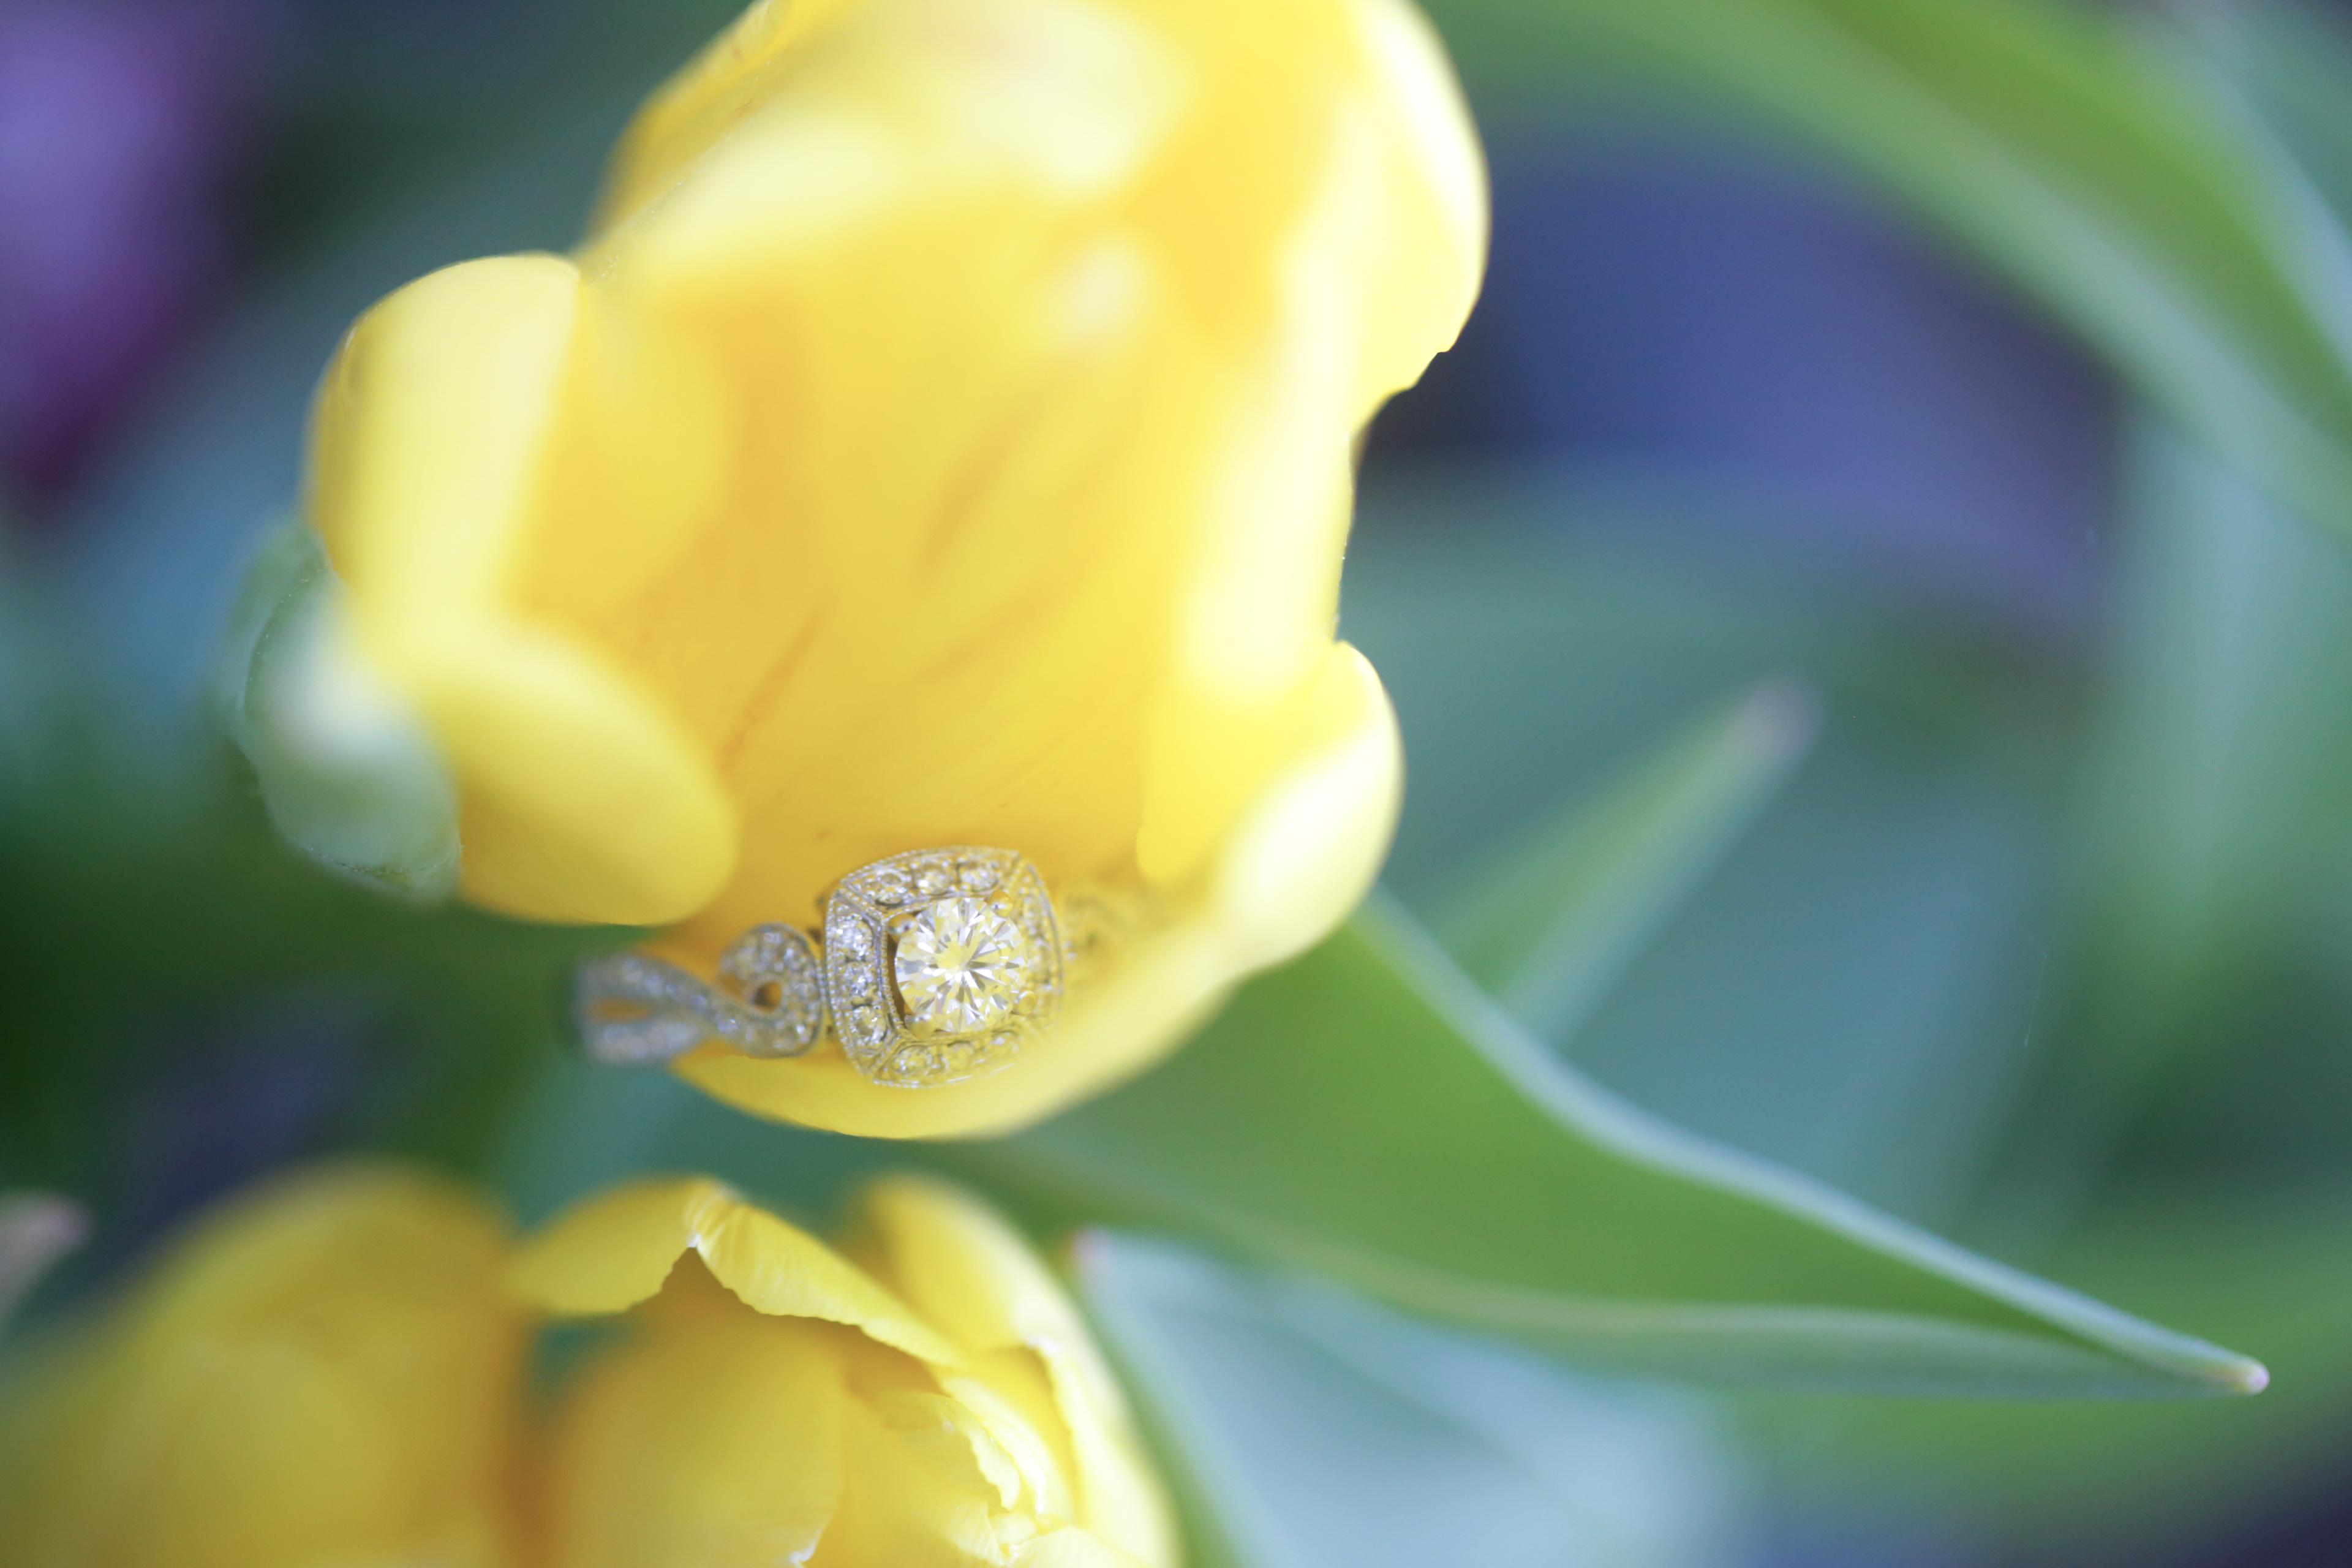 Tyla and Scott Ashland Engagement session cherry blossom (47 of 160).jpg